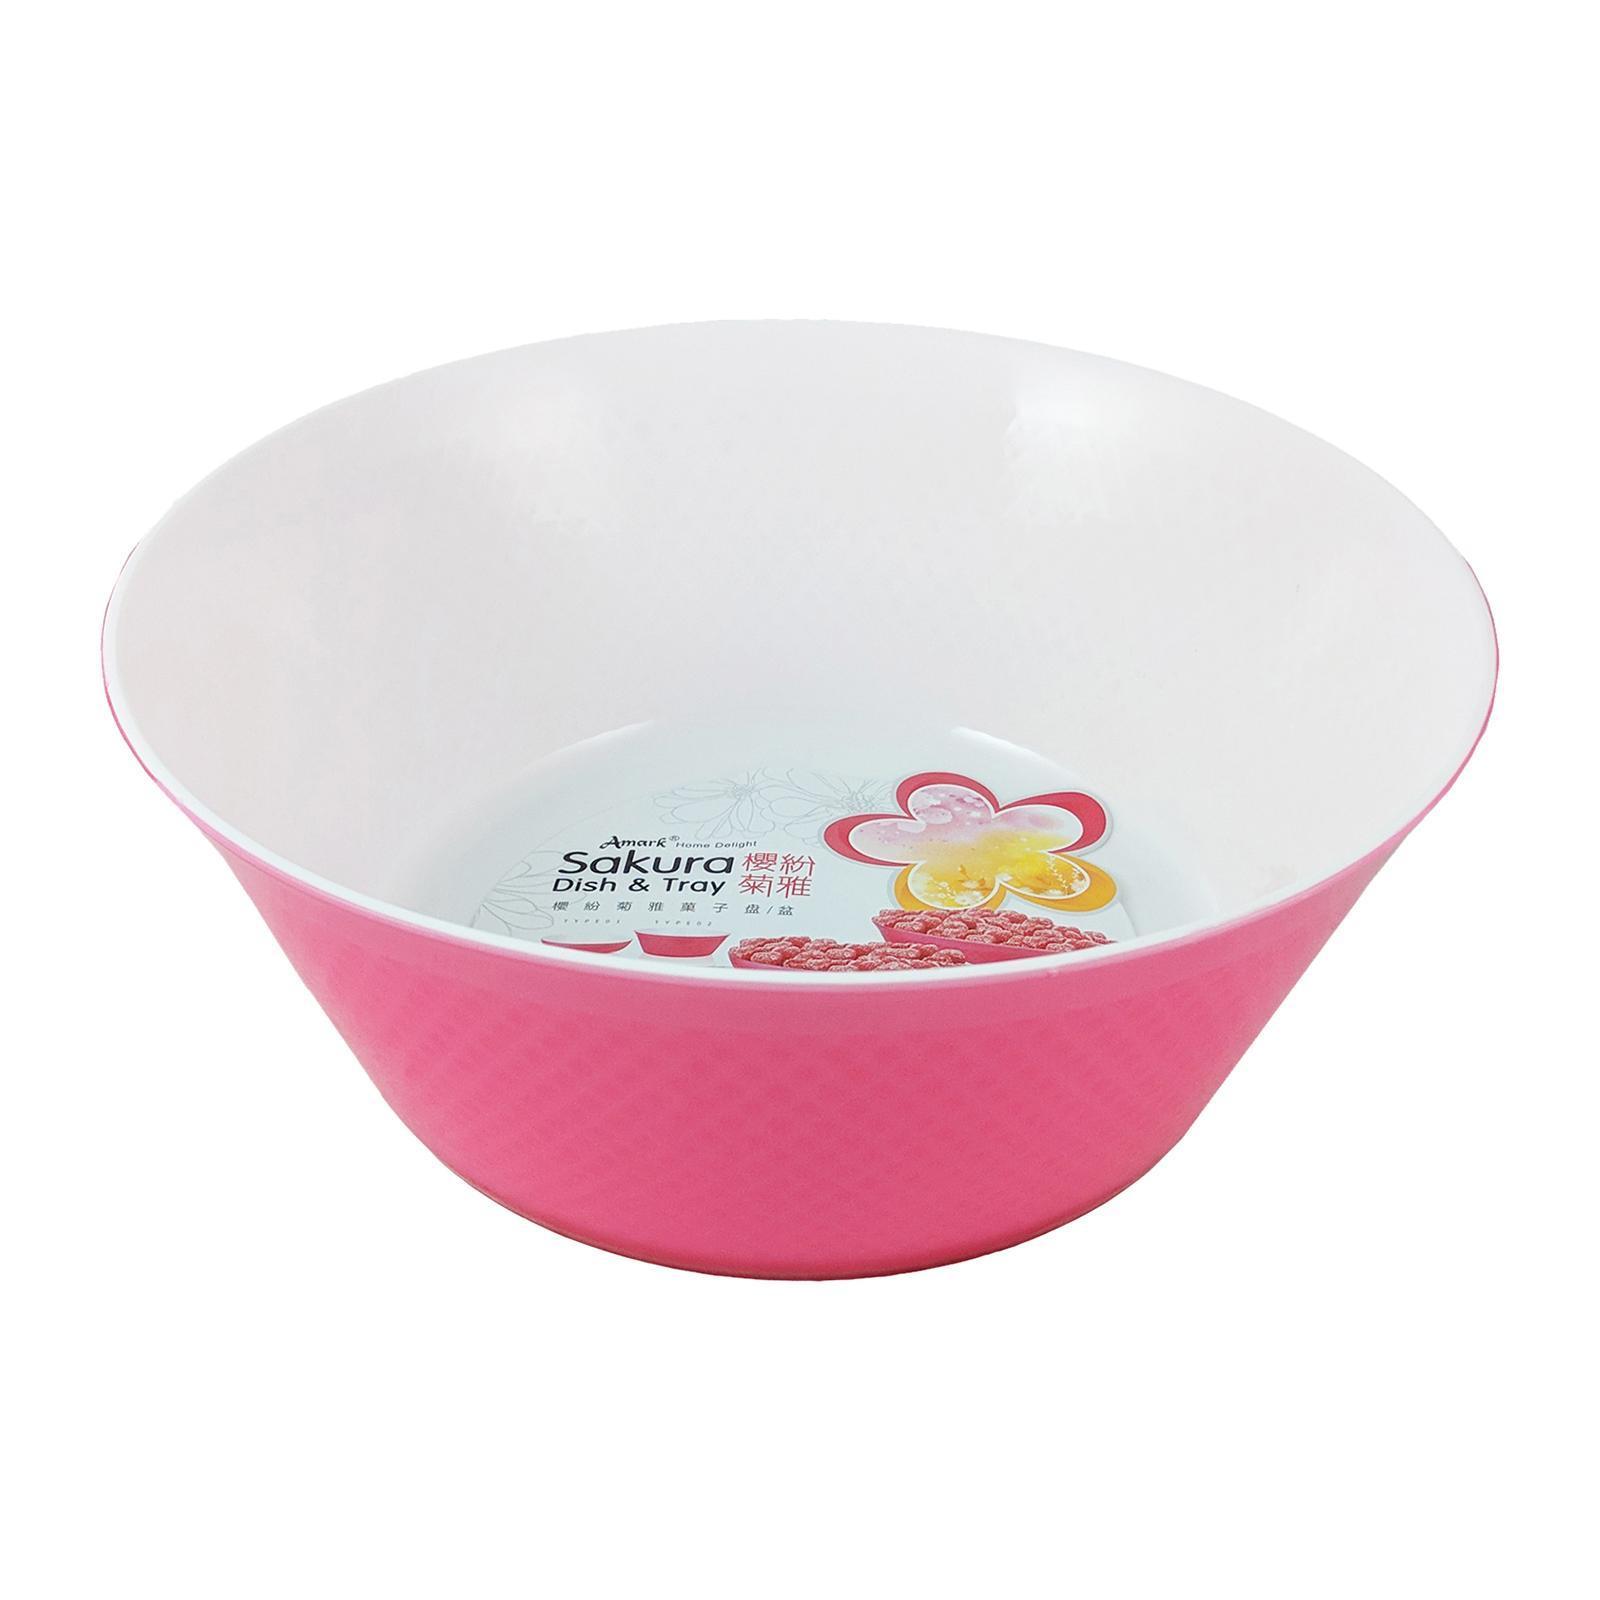 Amark Sakura Medium Deep Dish 23 CM (Pink)